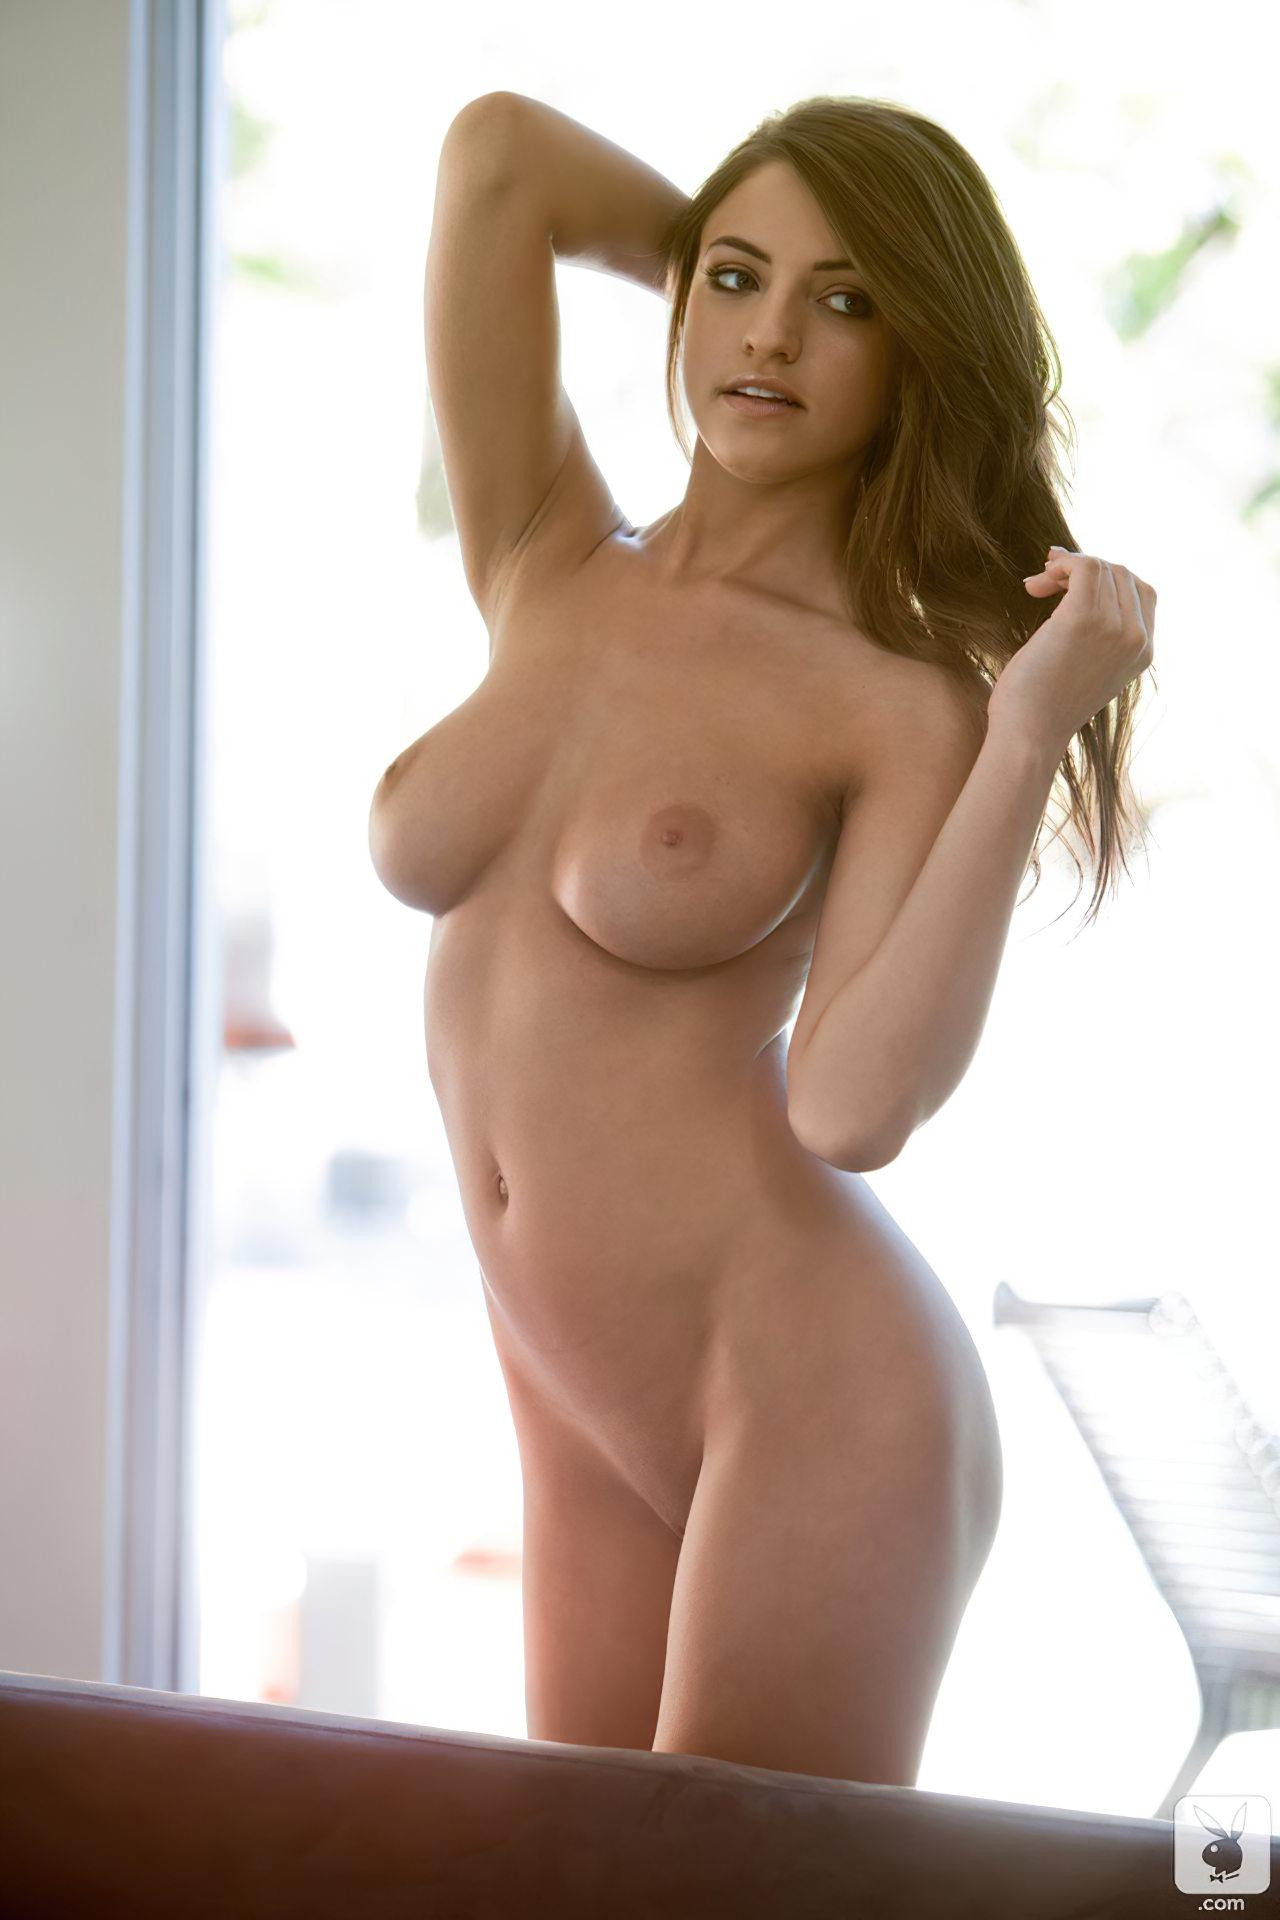 Fotos Mulheres Despidas (19)